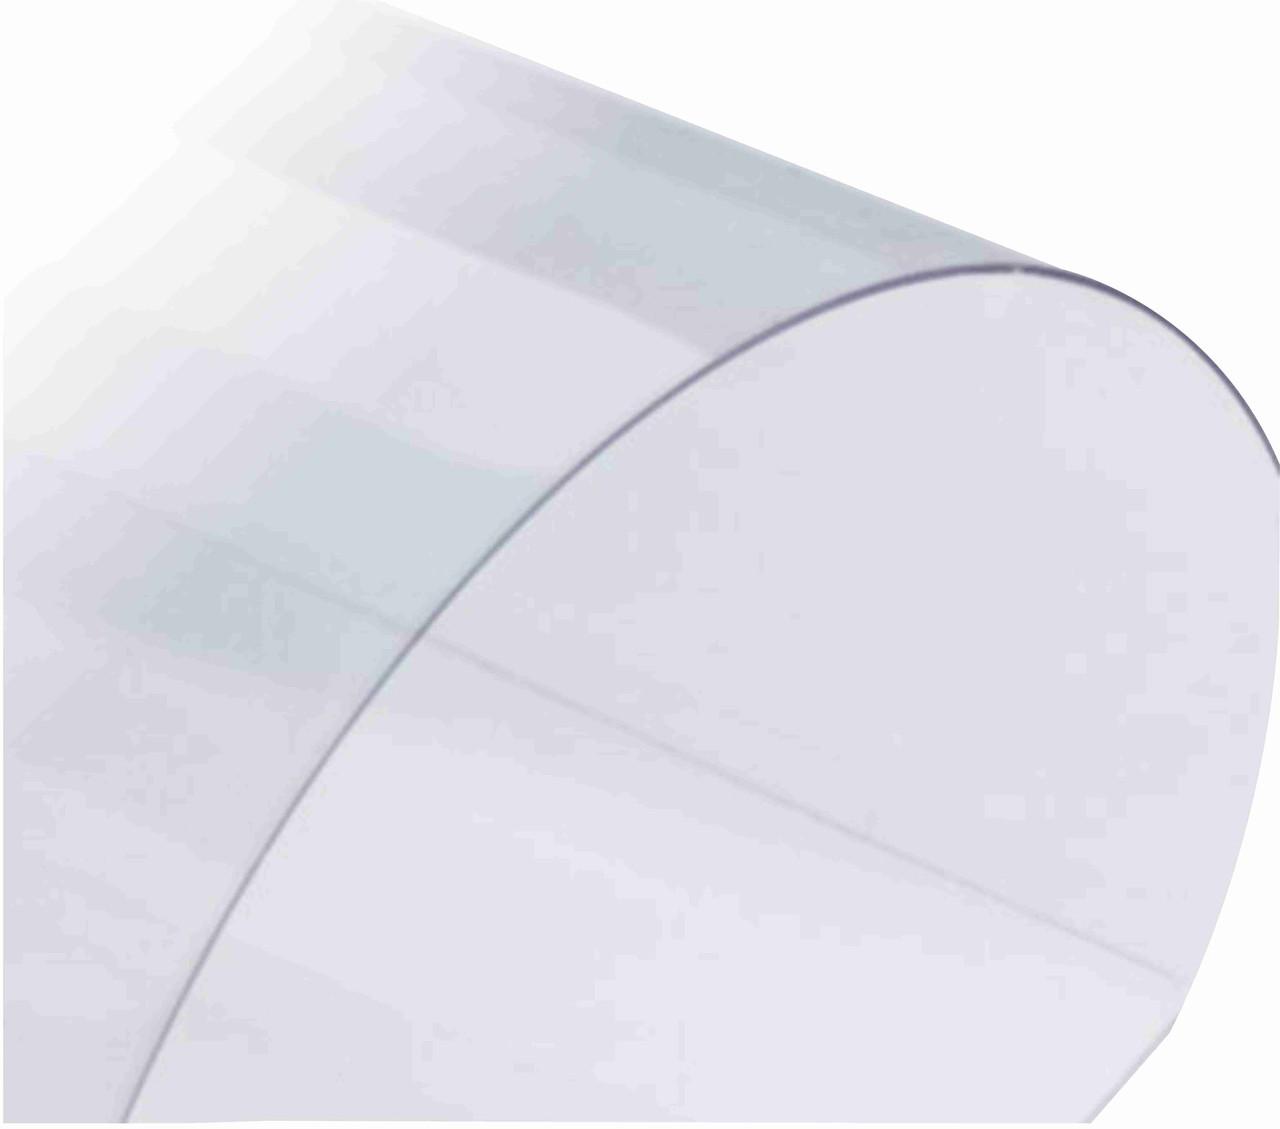 Прозрачный, жесткий листовой PVC пластик (0,5 мм) 1,22м х2,44м